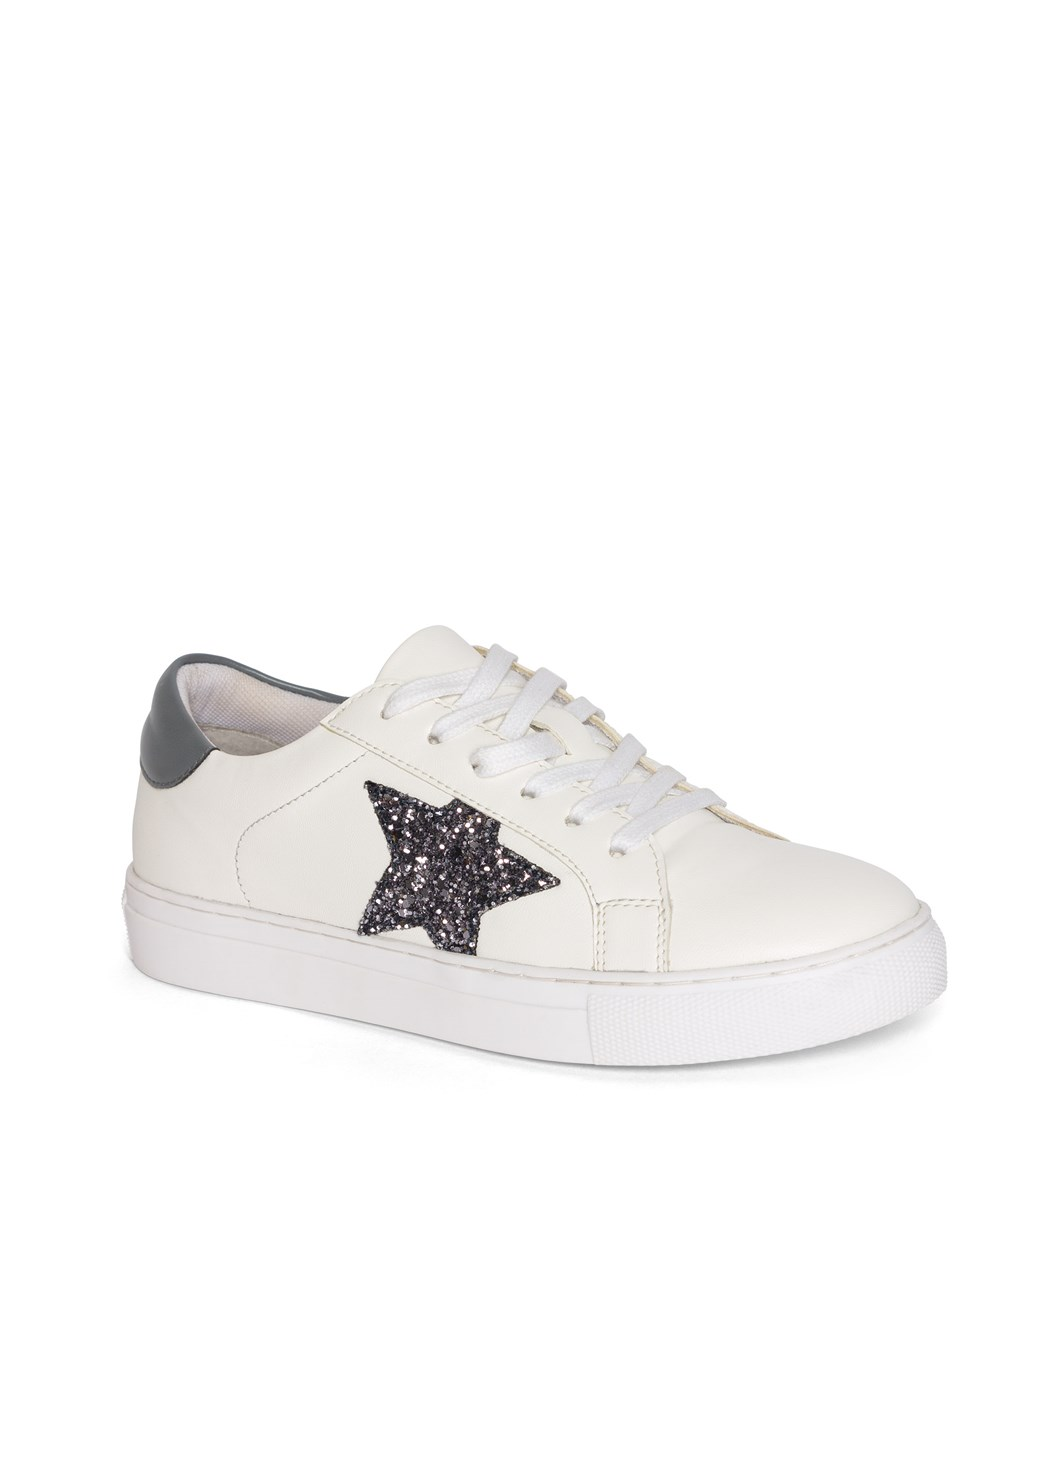 Lace Up Star Sneakers,Rhinestone Trim Zip Hoodie,Basic Cami Two Pack,Rhinestone Trim Jogger